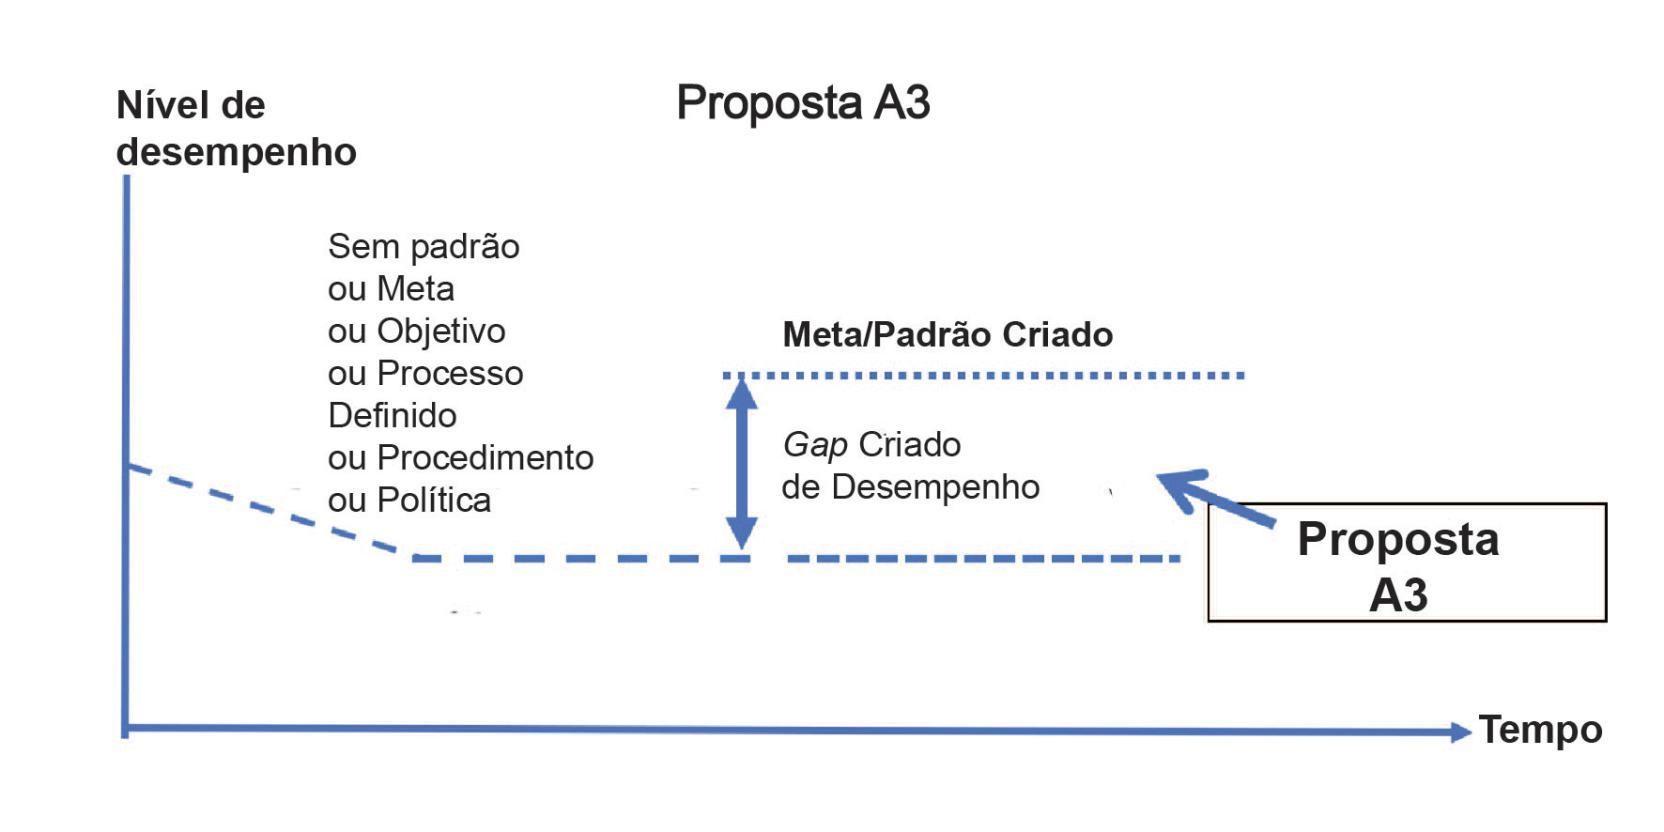 Proposta A3